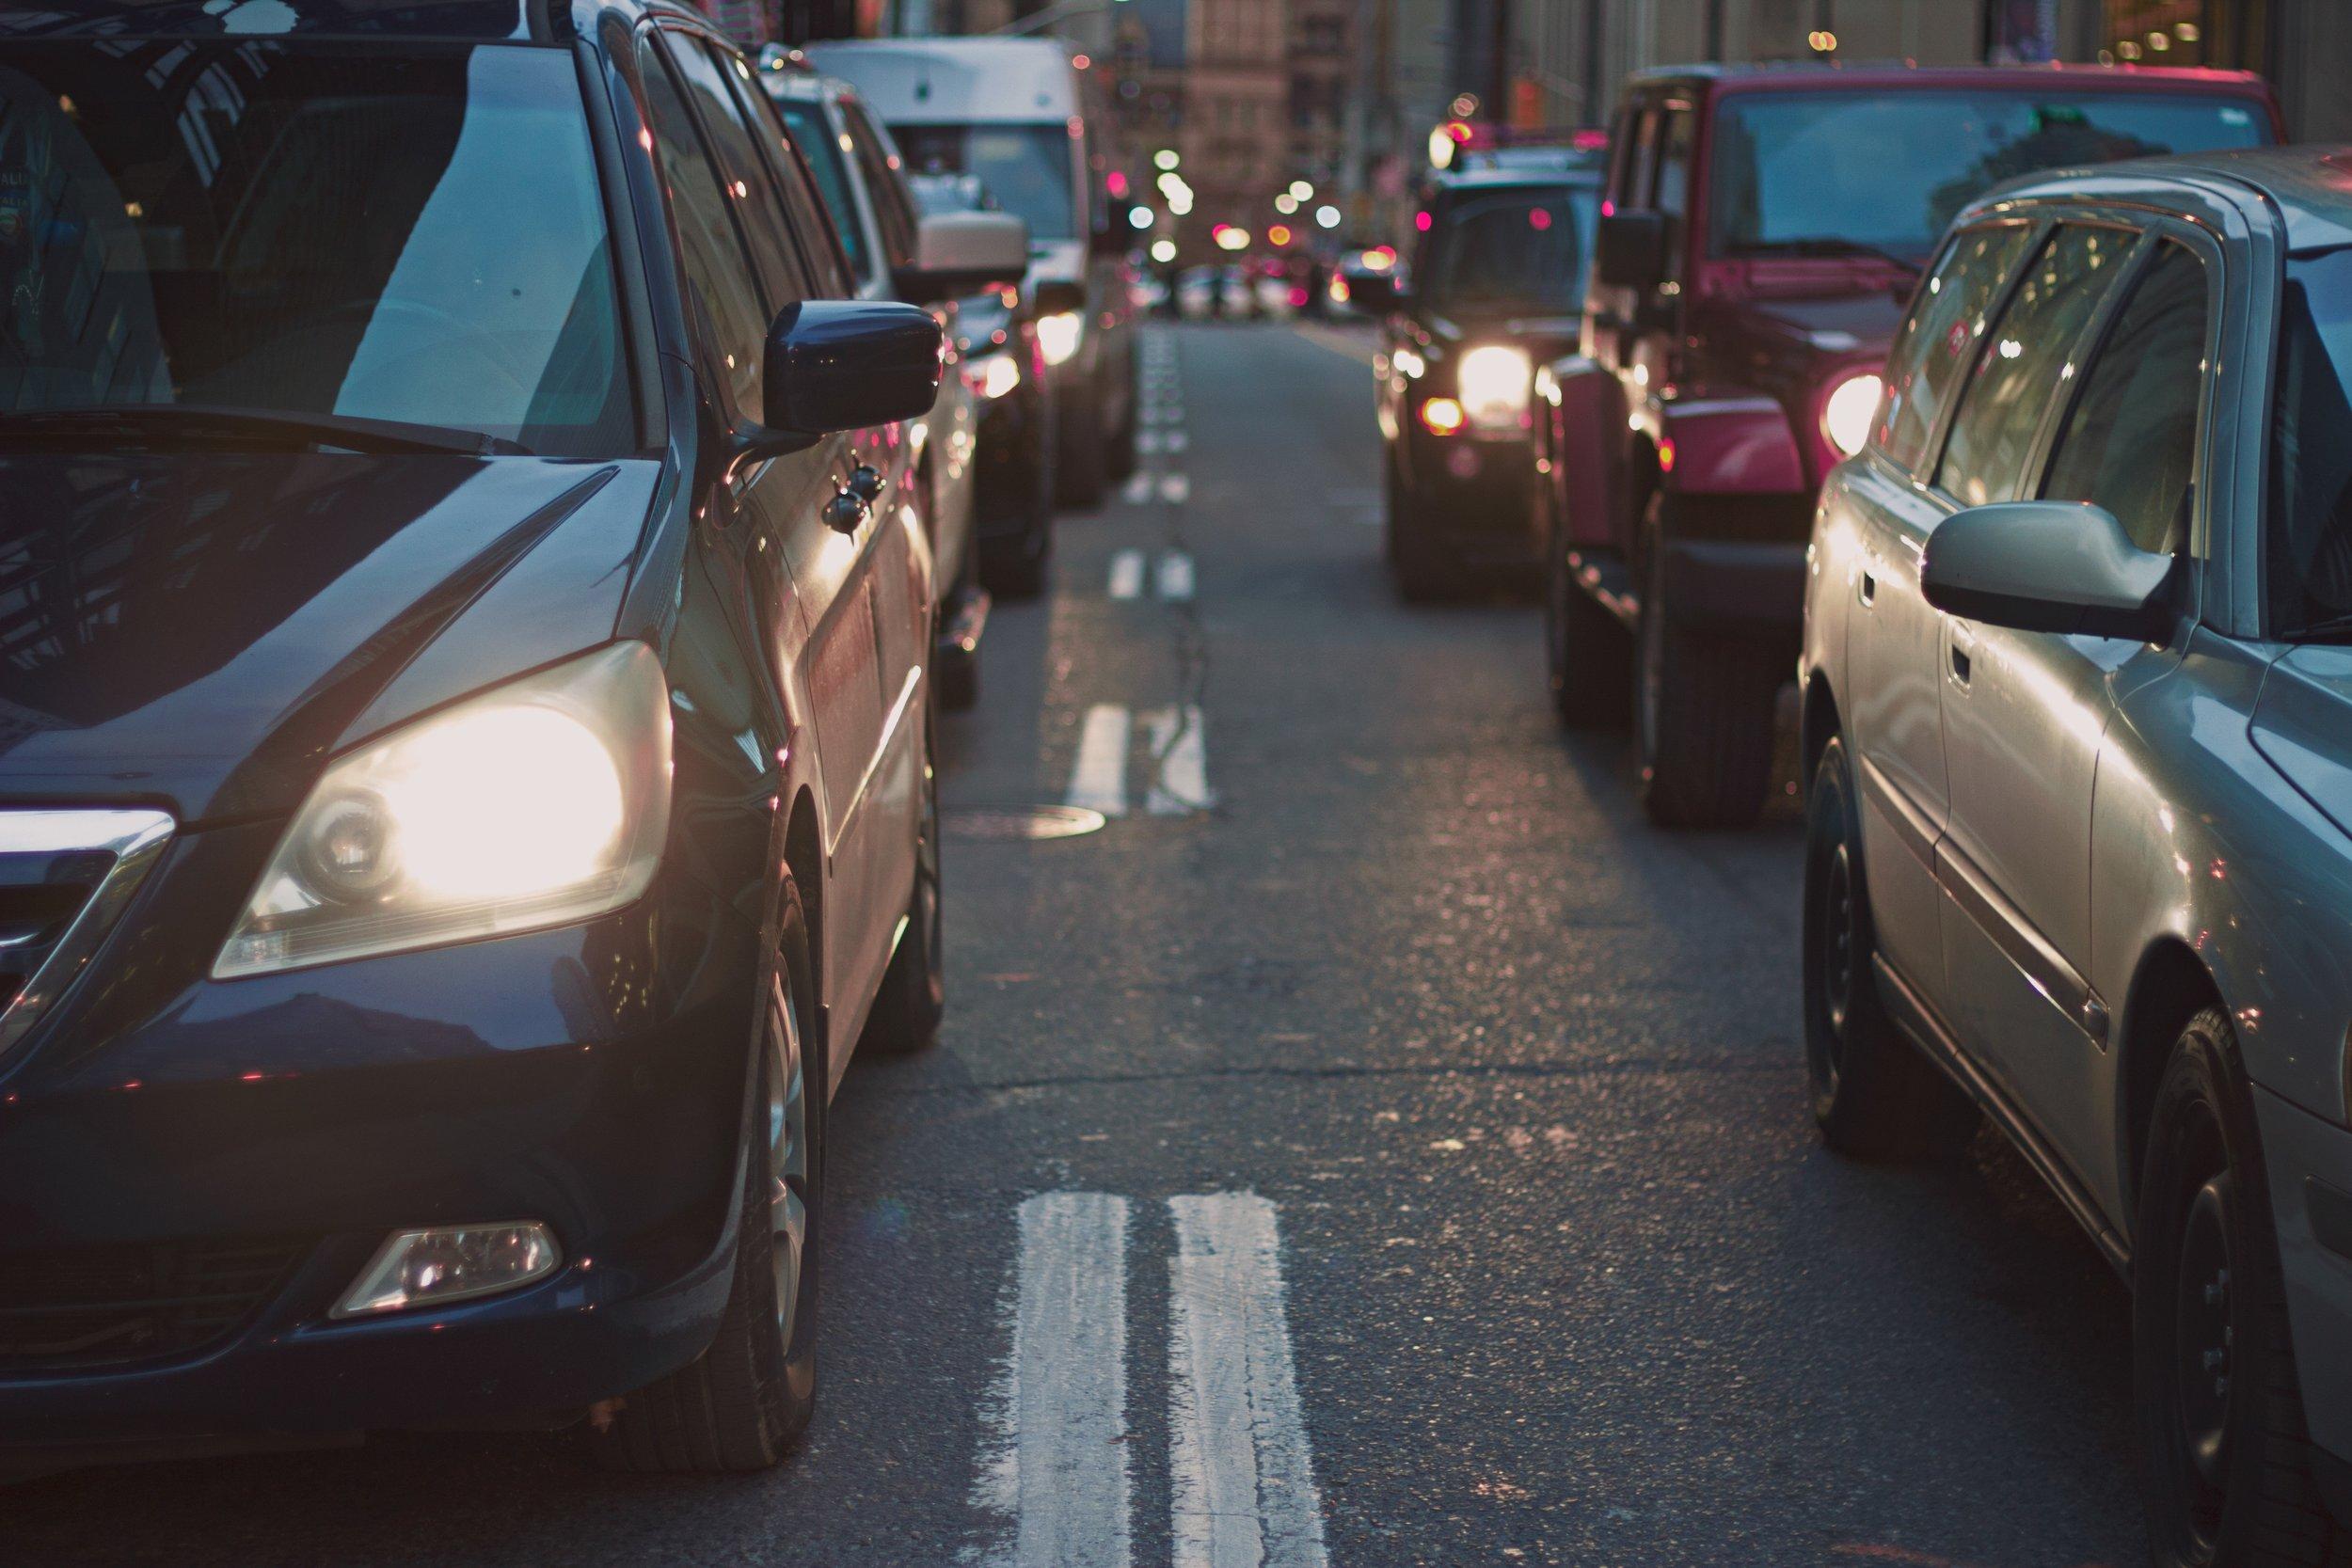 cars-congestion-street-7674.jpg